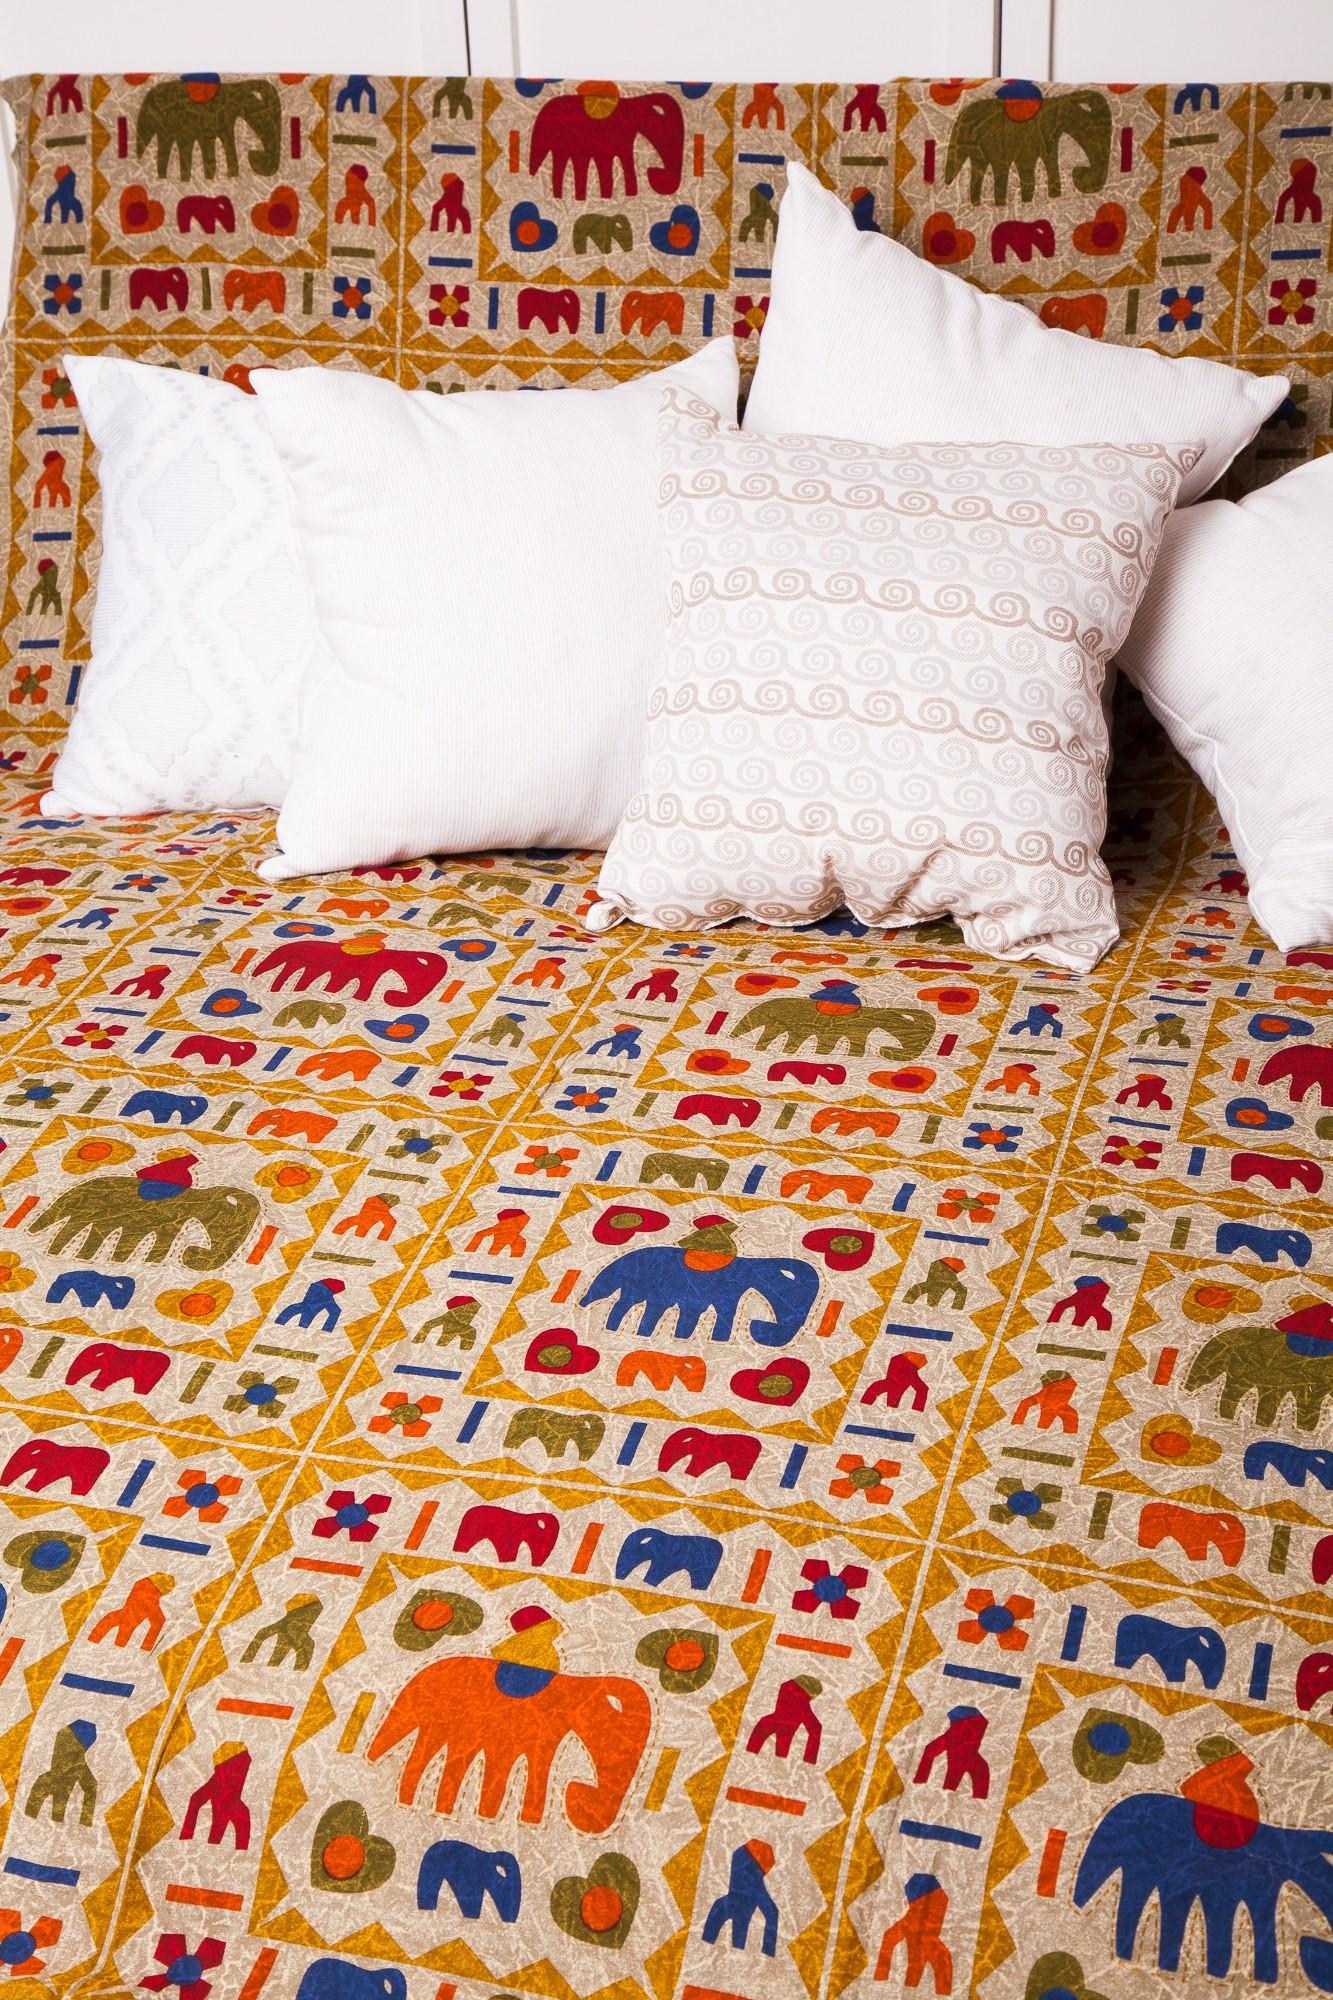 Cuvertura Arhi cu elefanti-single